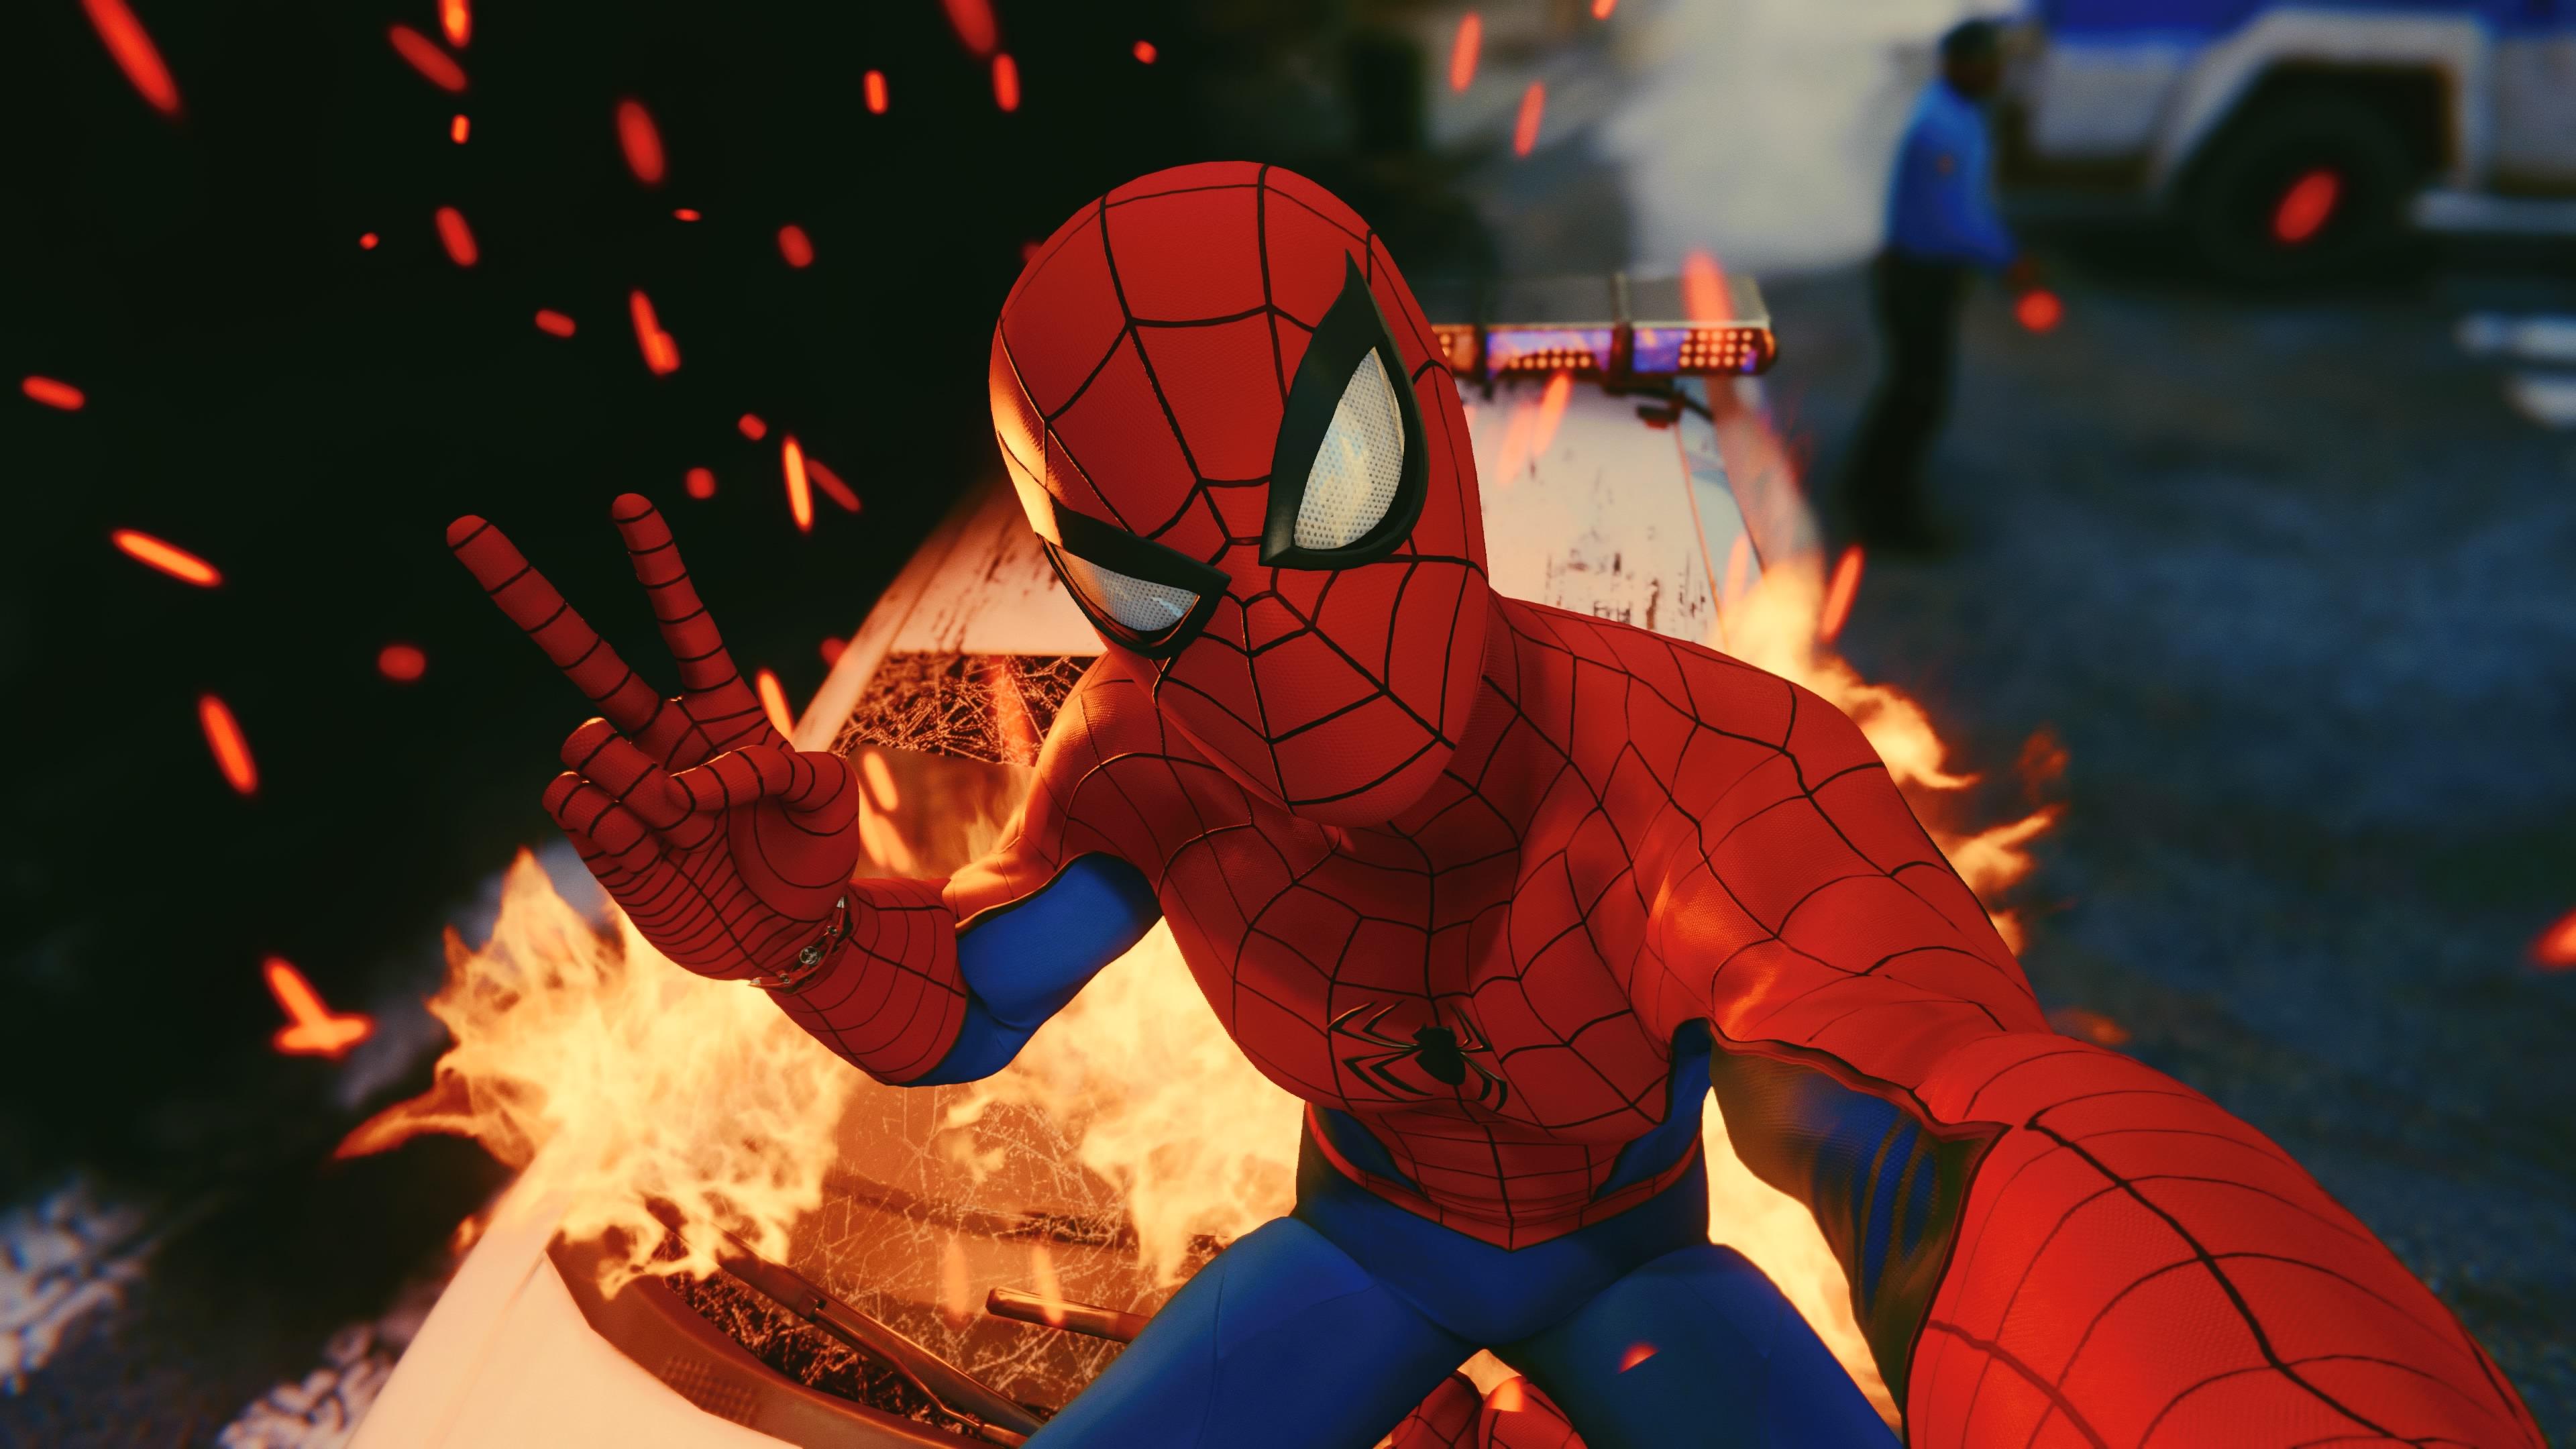 1920x1080 Spiderman Taking Selfie Ps4 4k 2018 Laptop Full Hd 1080p